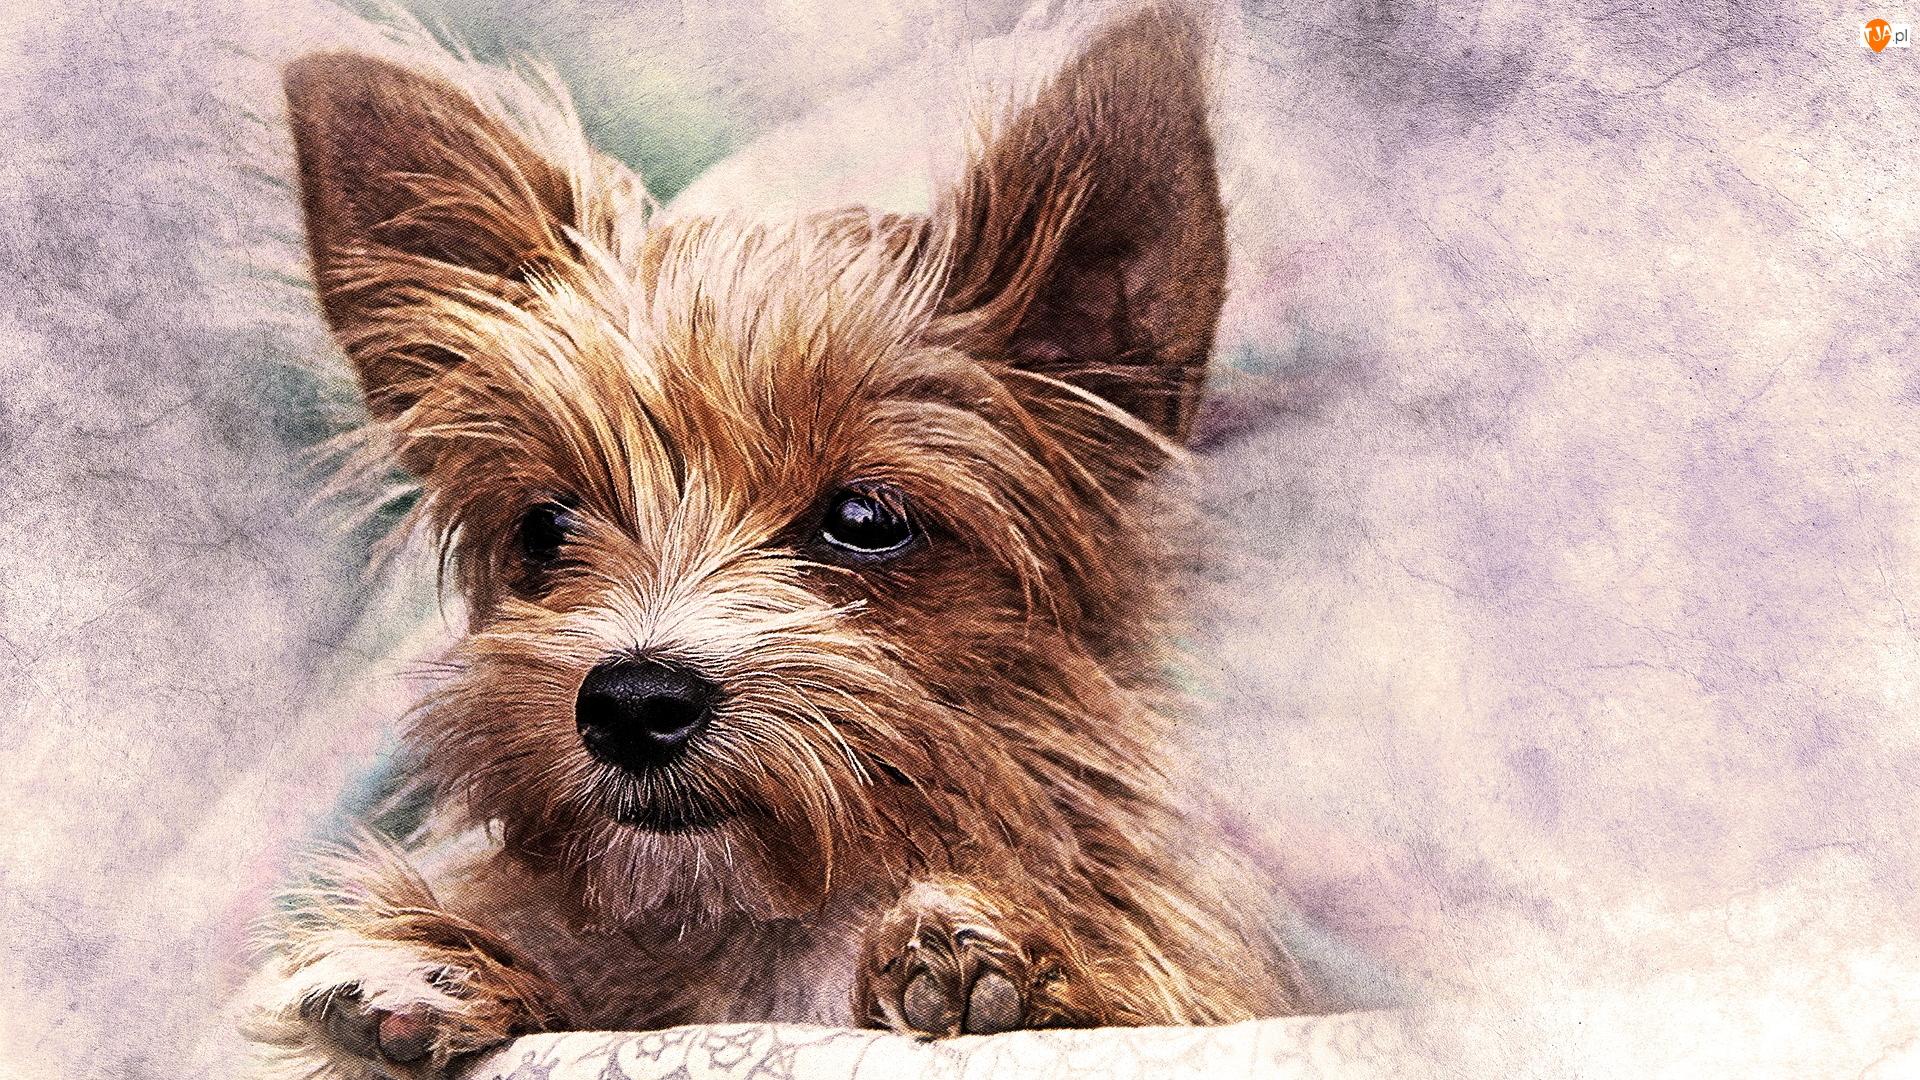 Yorkshire terrier, Grafika, Szczeniak, Pies, Mordka